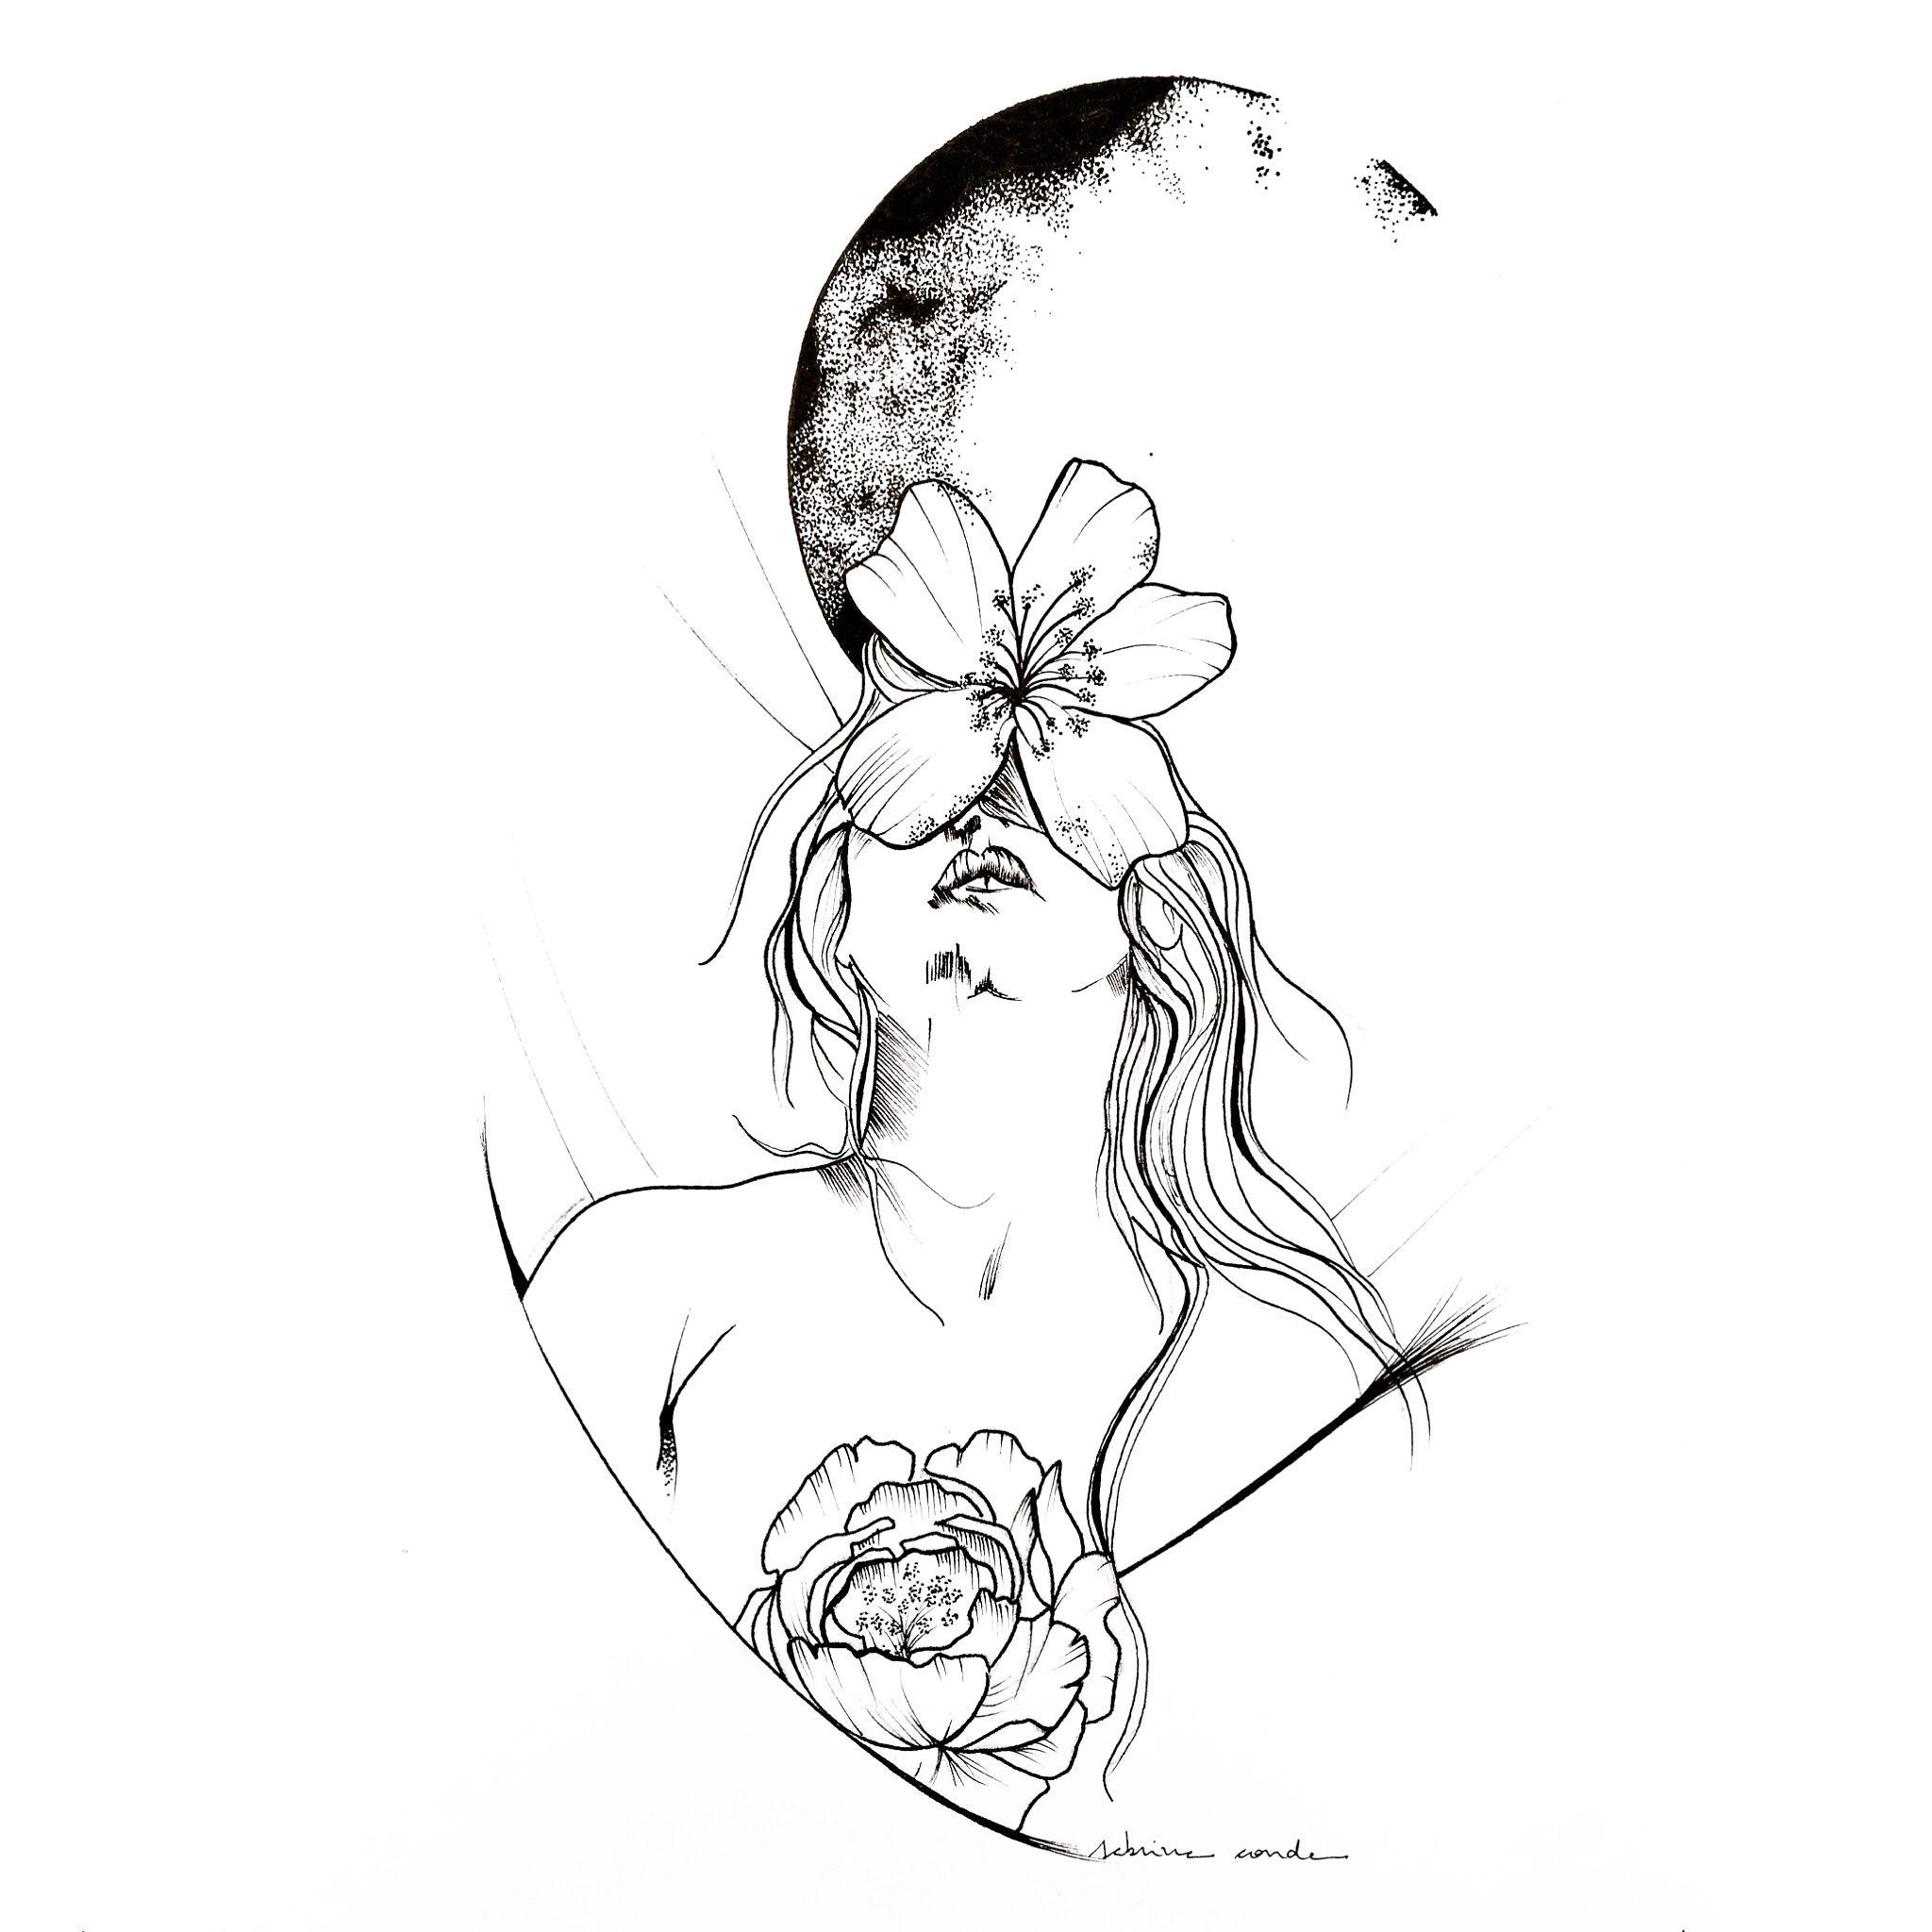 Pin By Valen Guth On Illustrations Art Sketches Art Tattoo Art